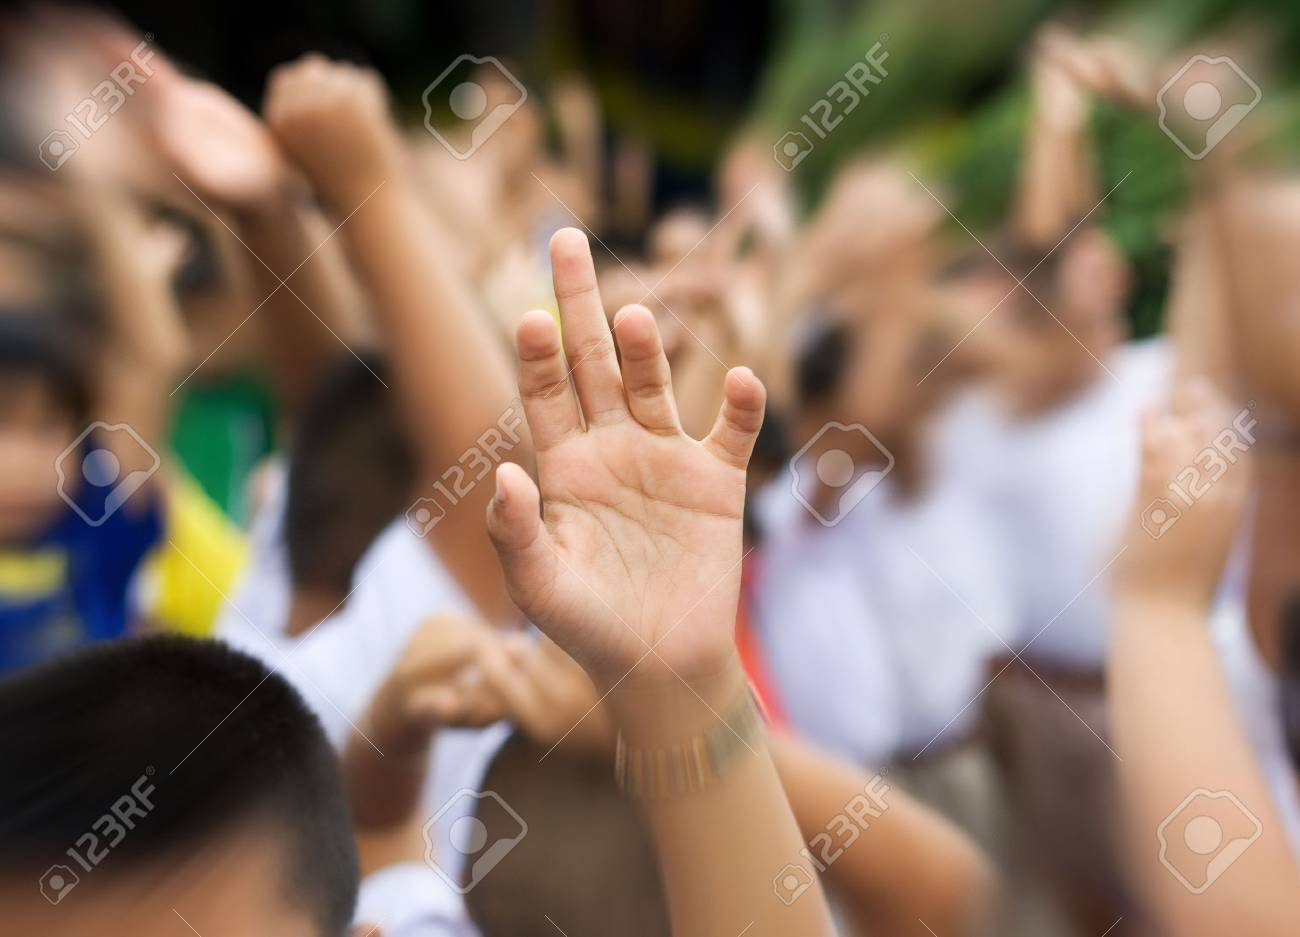 sharp hand raised in blury schoolyard background zooming in Stock Photo - 4189883